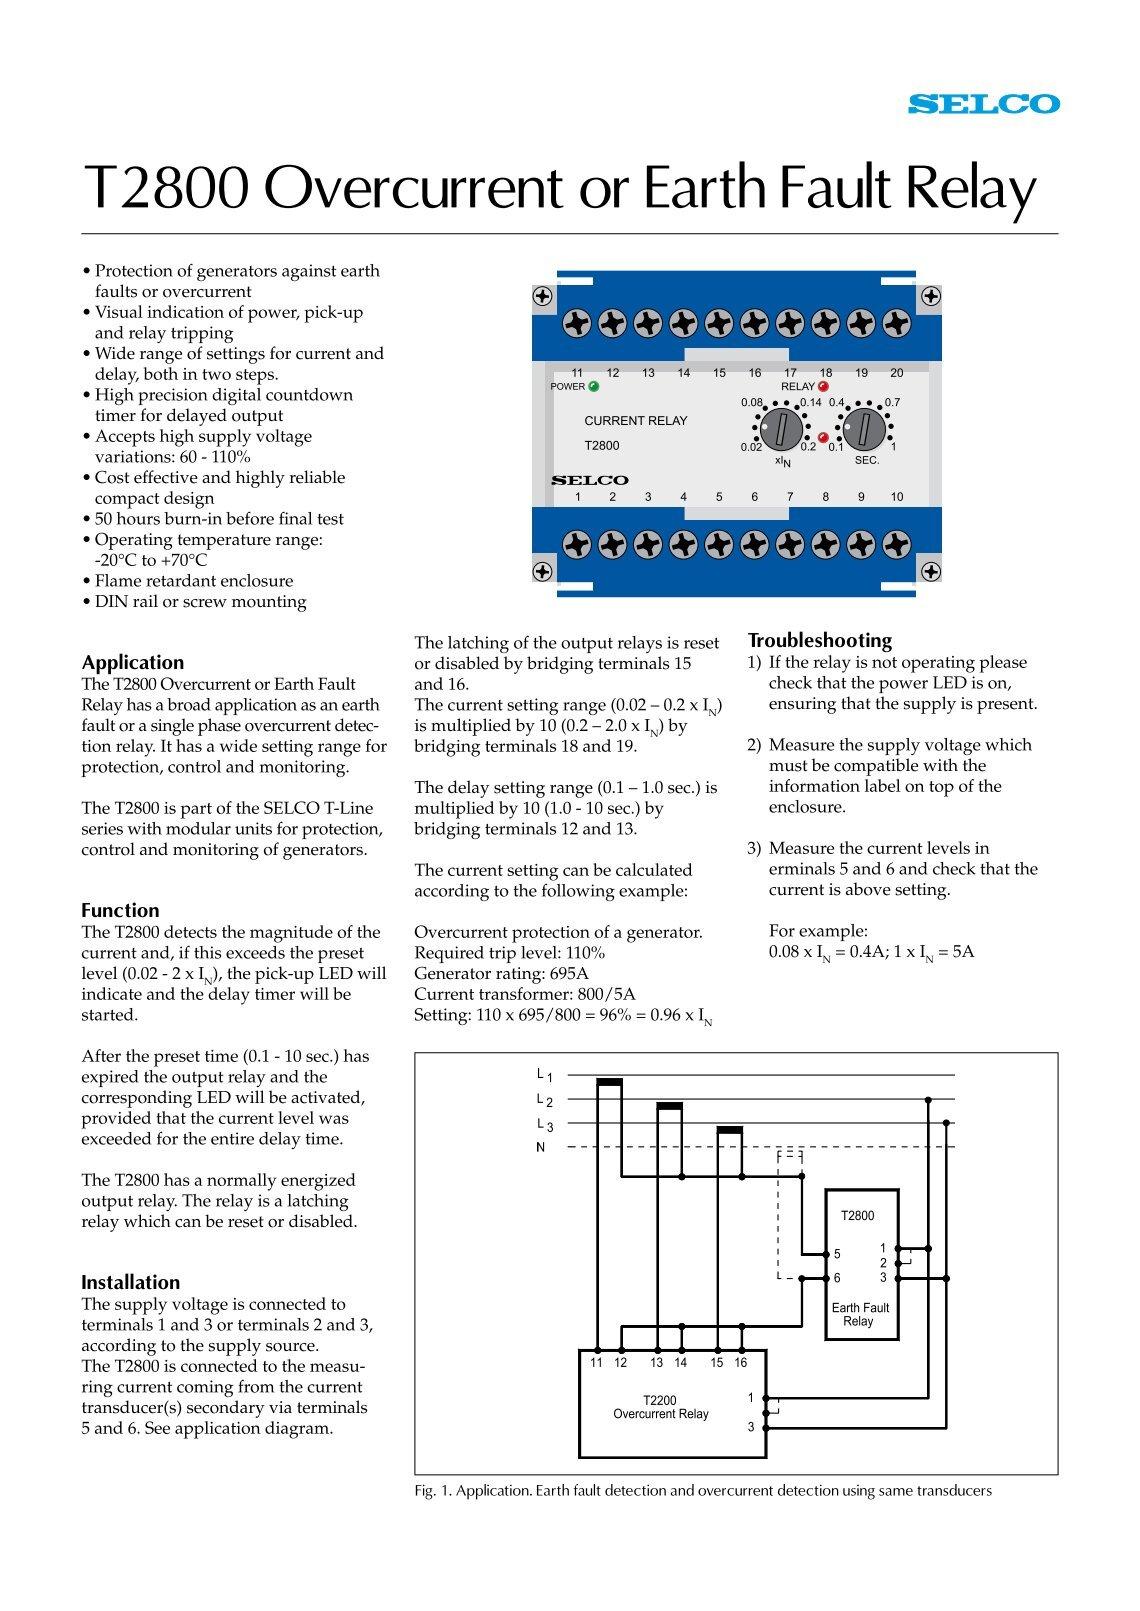 International 9200 Fuse Box Wiring Library 2007 9400i Diagram Truck Diagrams Ez Go Golf Cart Light On 2009 Ford F 150